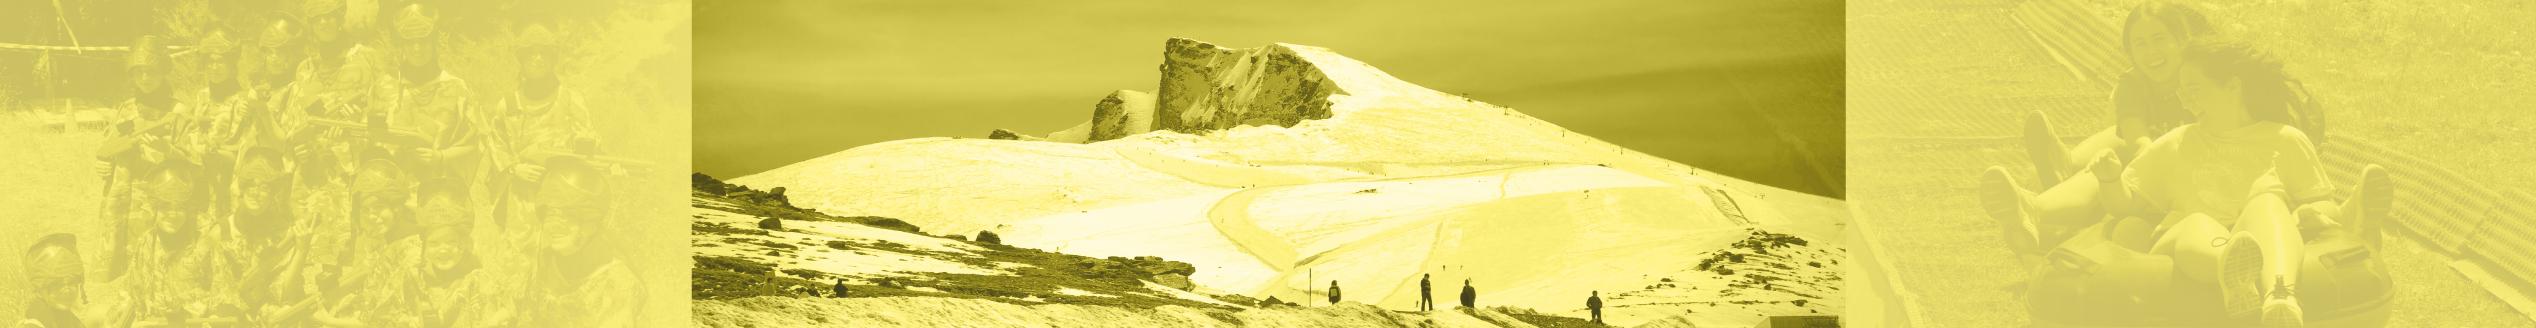 Fondo Slider Web Sierra Nevada Cl 19mar21